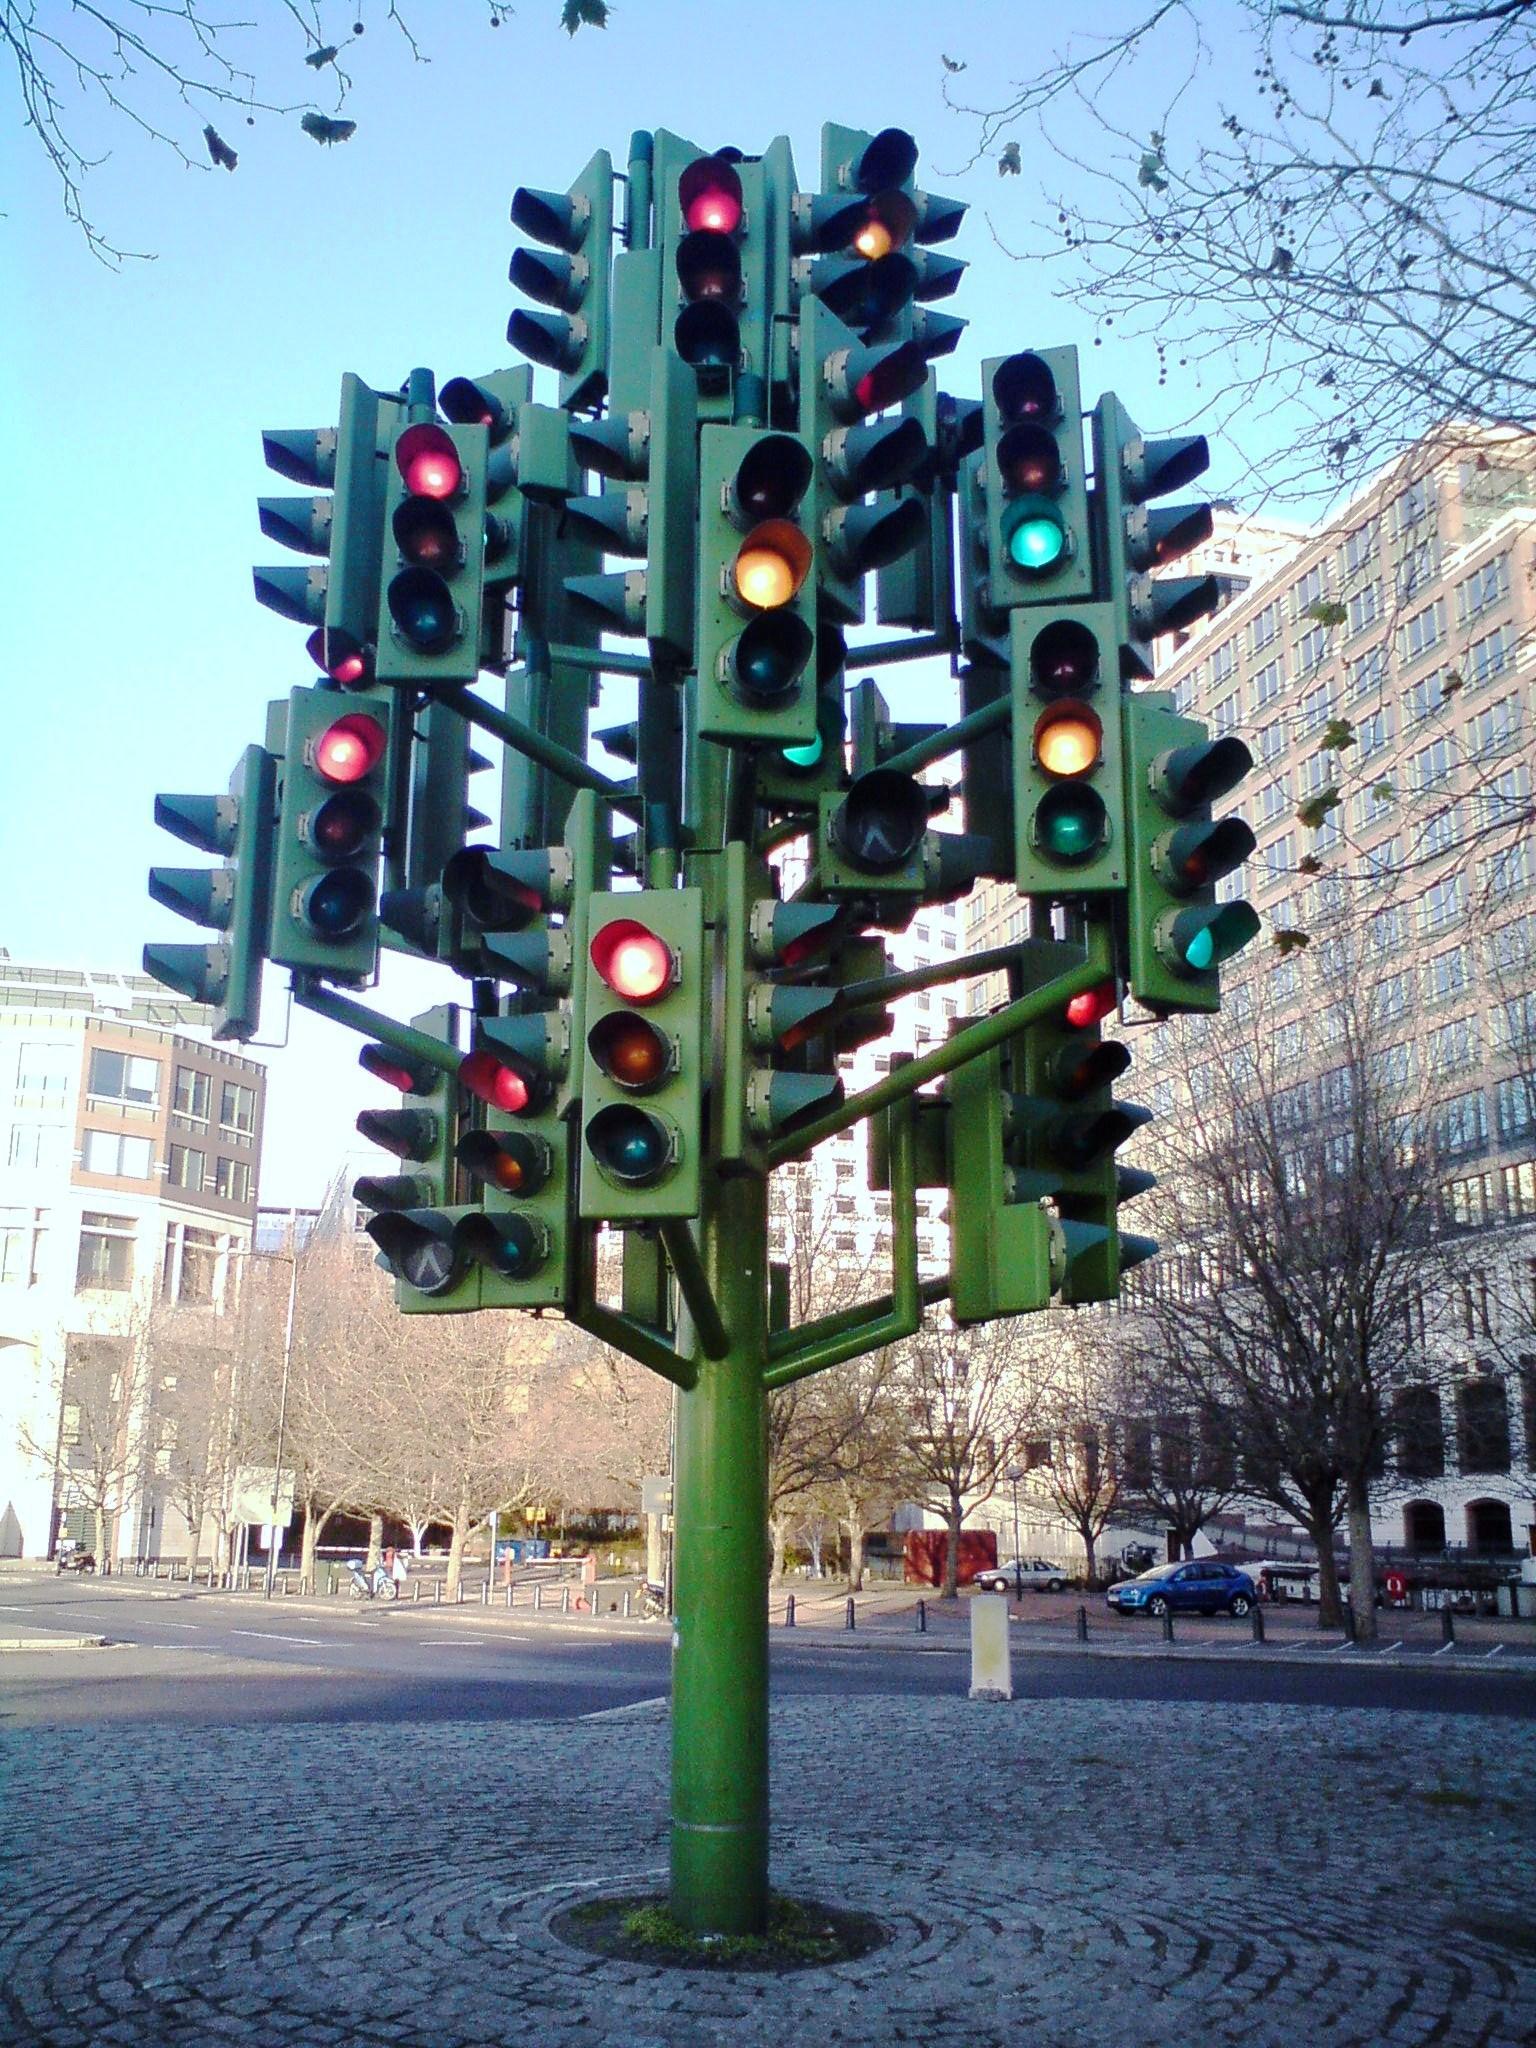 semaforos1-pierre-vivant-arbol-navidad-blog-hostalia